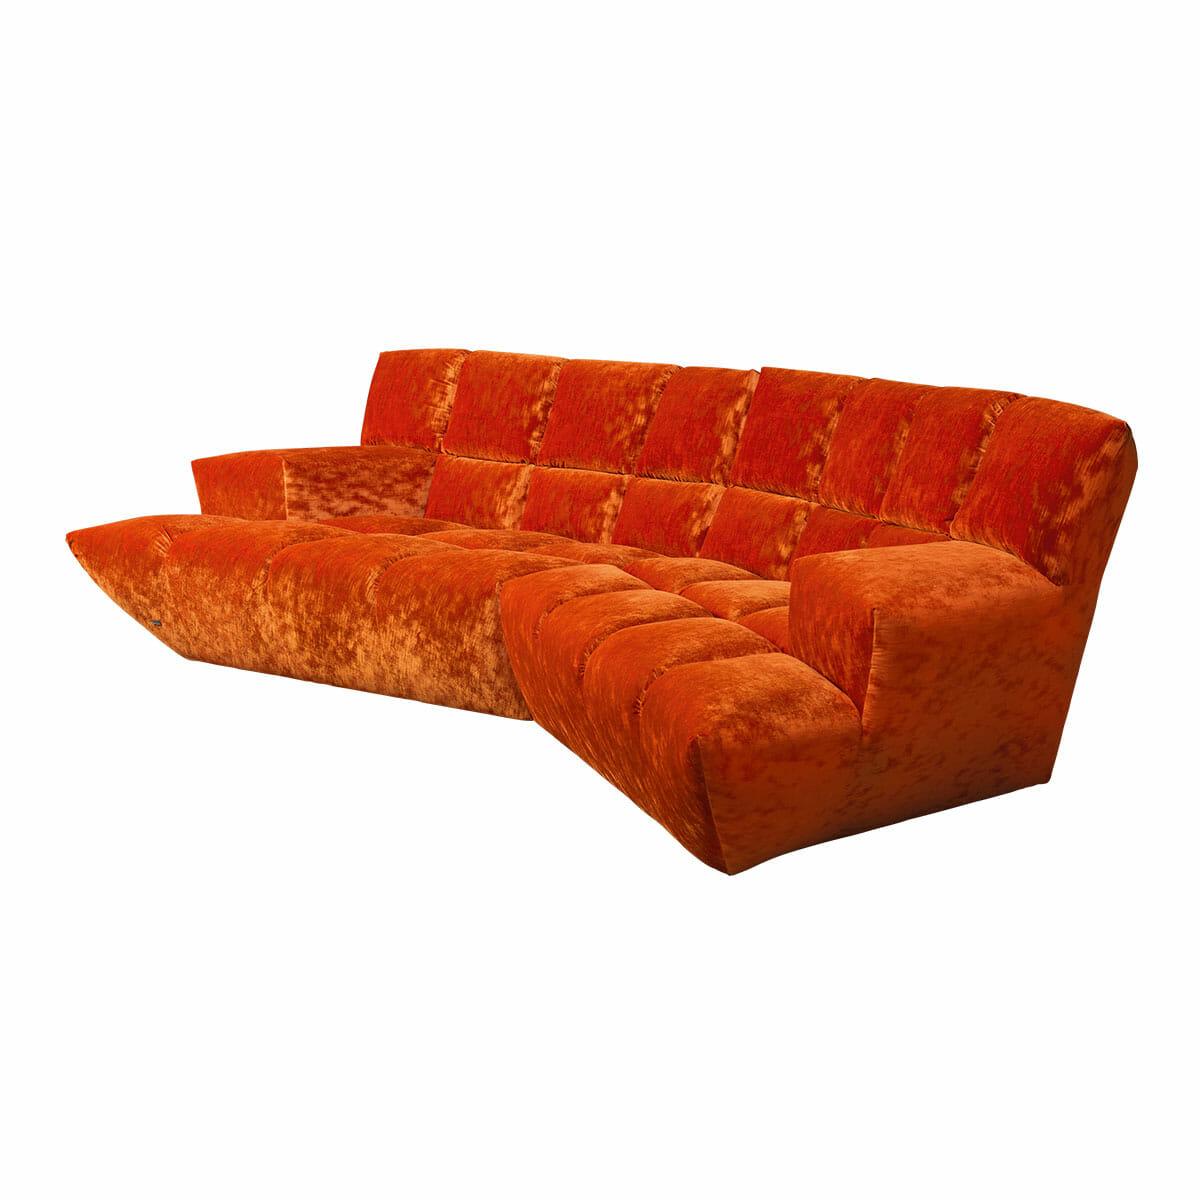 cloud 7 by bretz top angebot an bretz cloud 7 sofas ab 4. Black Bedroom Furniture Sets. Home Design Ideas